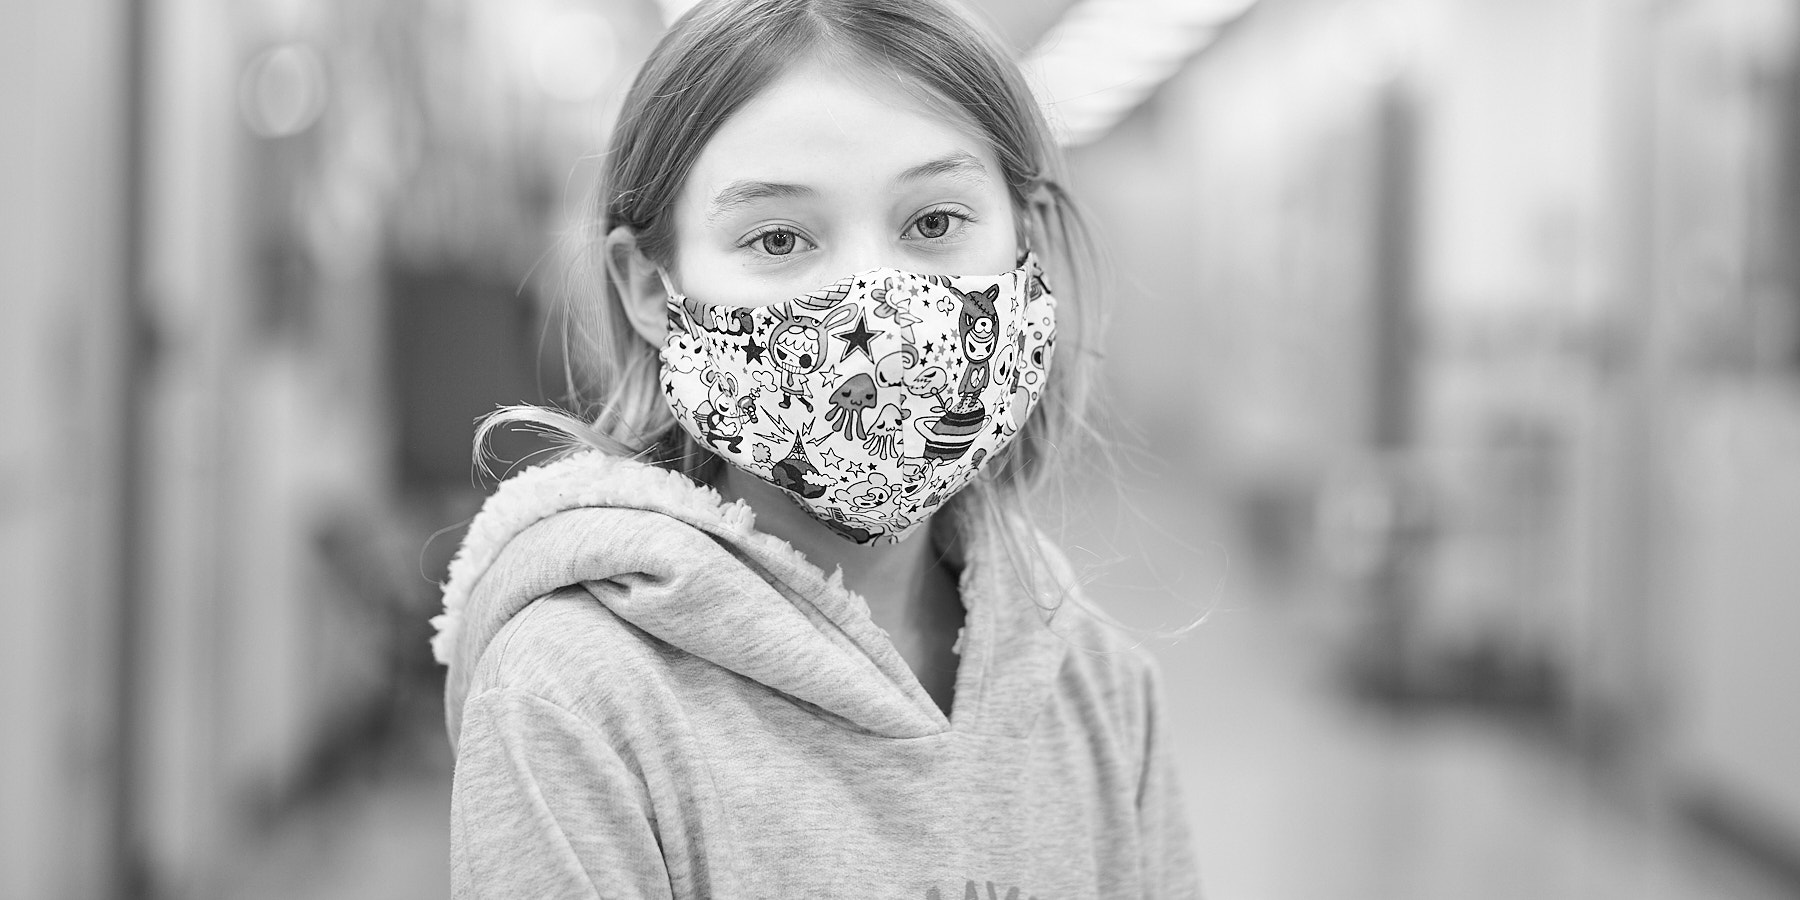 salt spring elementary school student © johncameron.ca